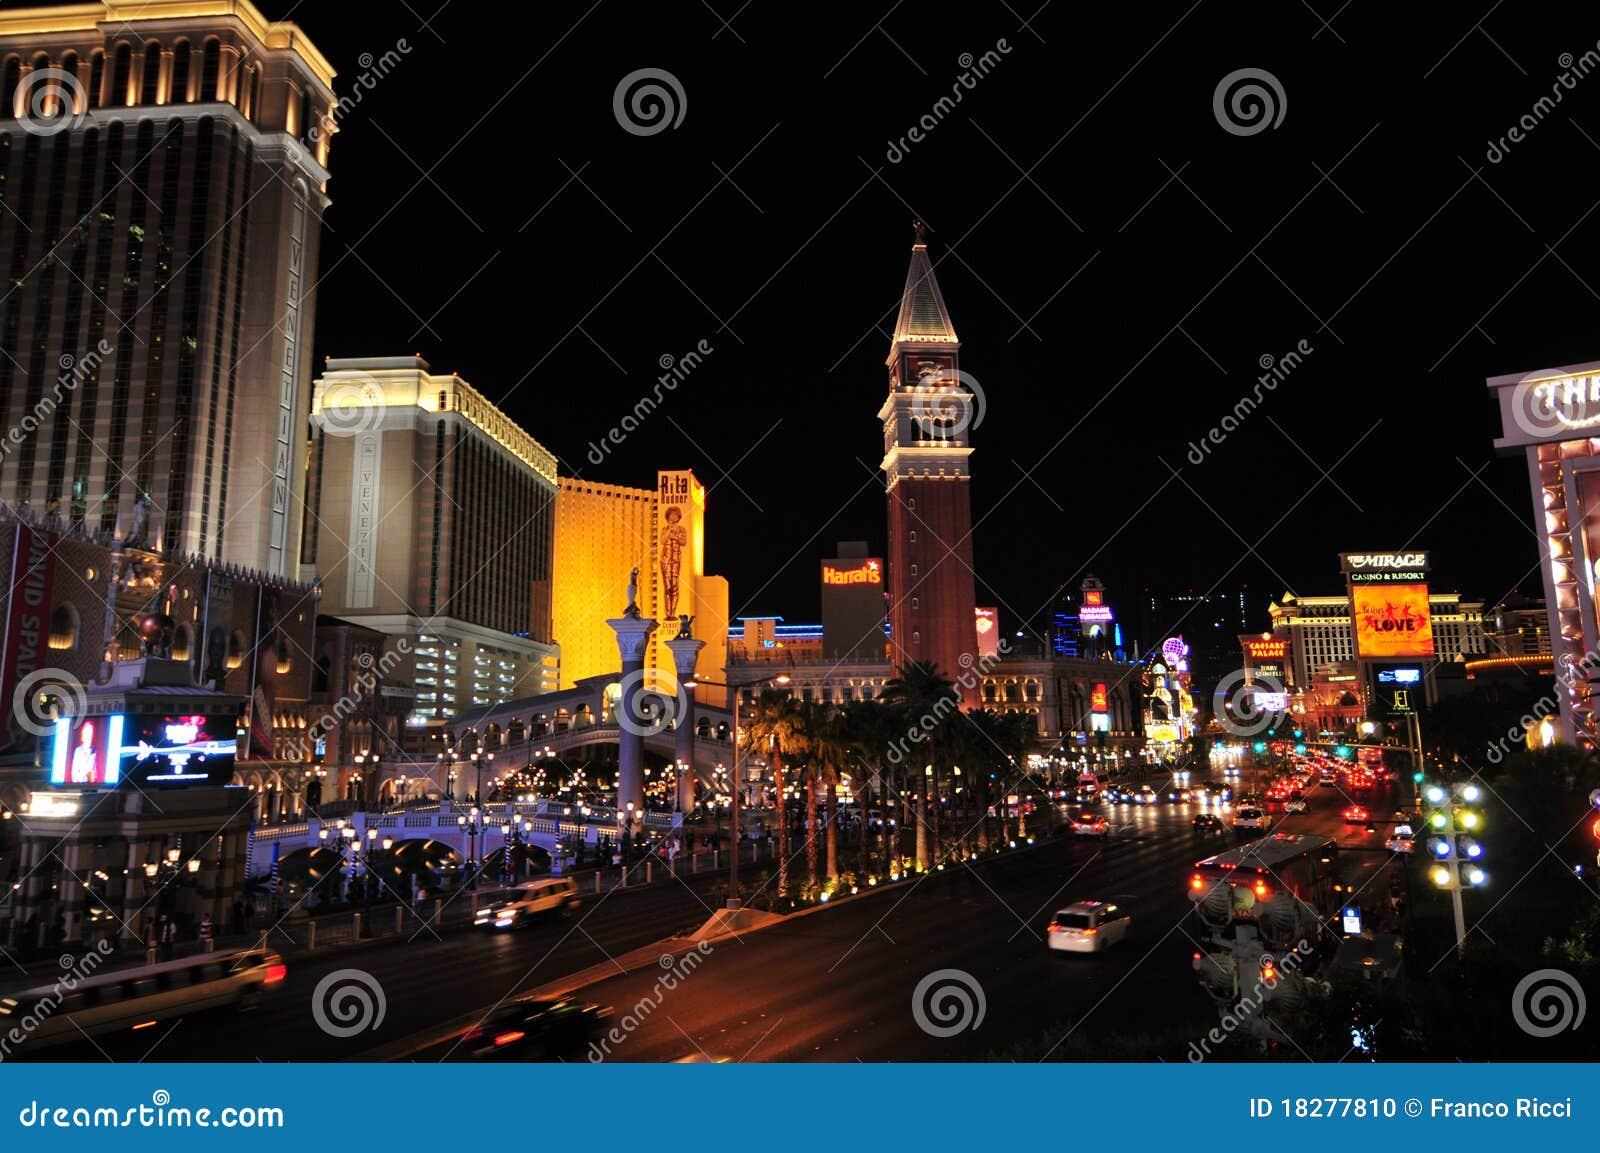 hoteles que no cobren resort fee: Foro de Las Vegas en